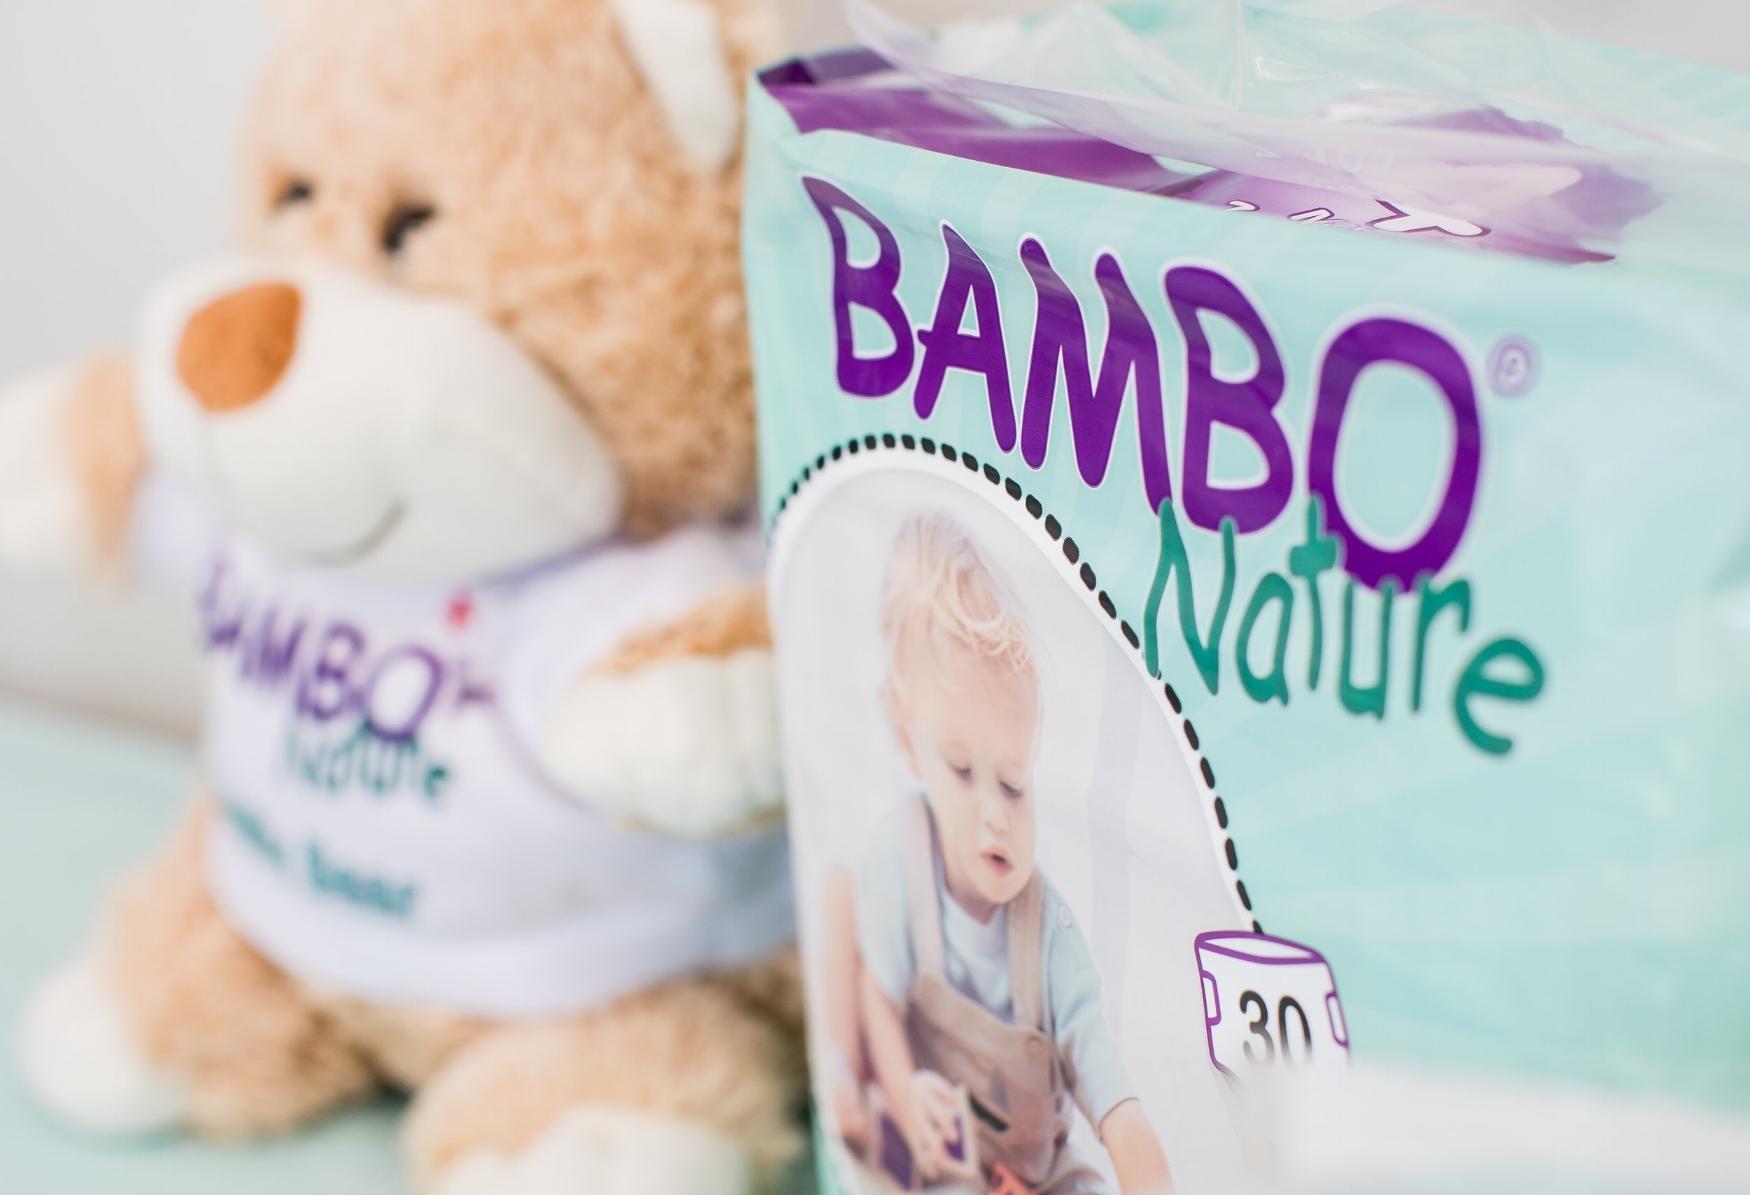 Bambo Nature - New Eco Nappy Launch